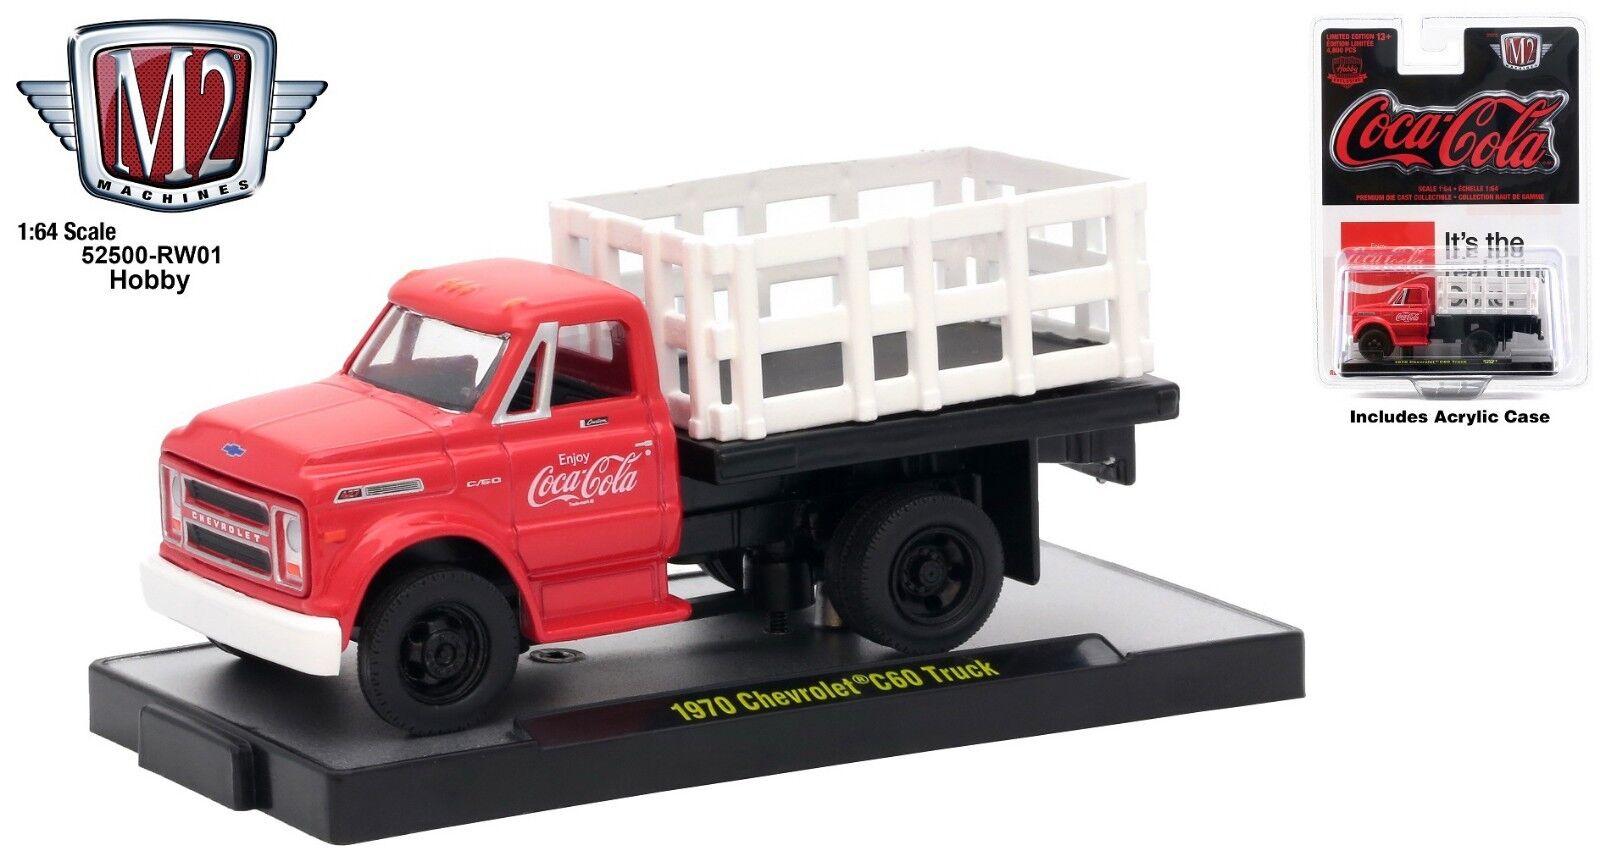 M2 Machines 1:64 Coca-Cola Hobby 1970 Chevrolet C-60 Truck Diecast Model Truck